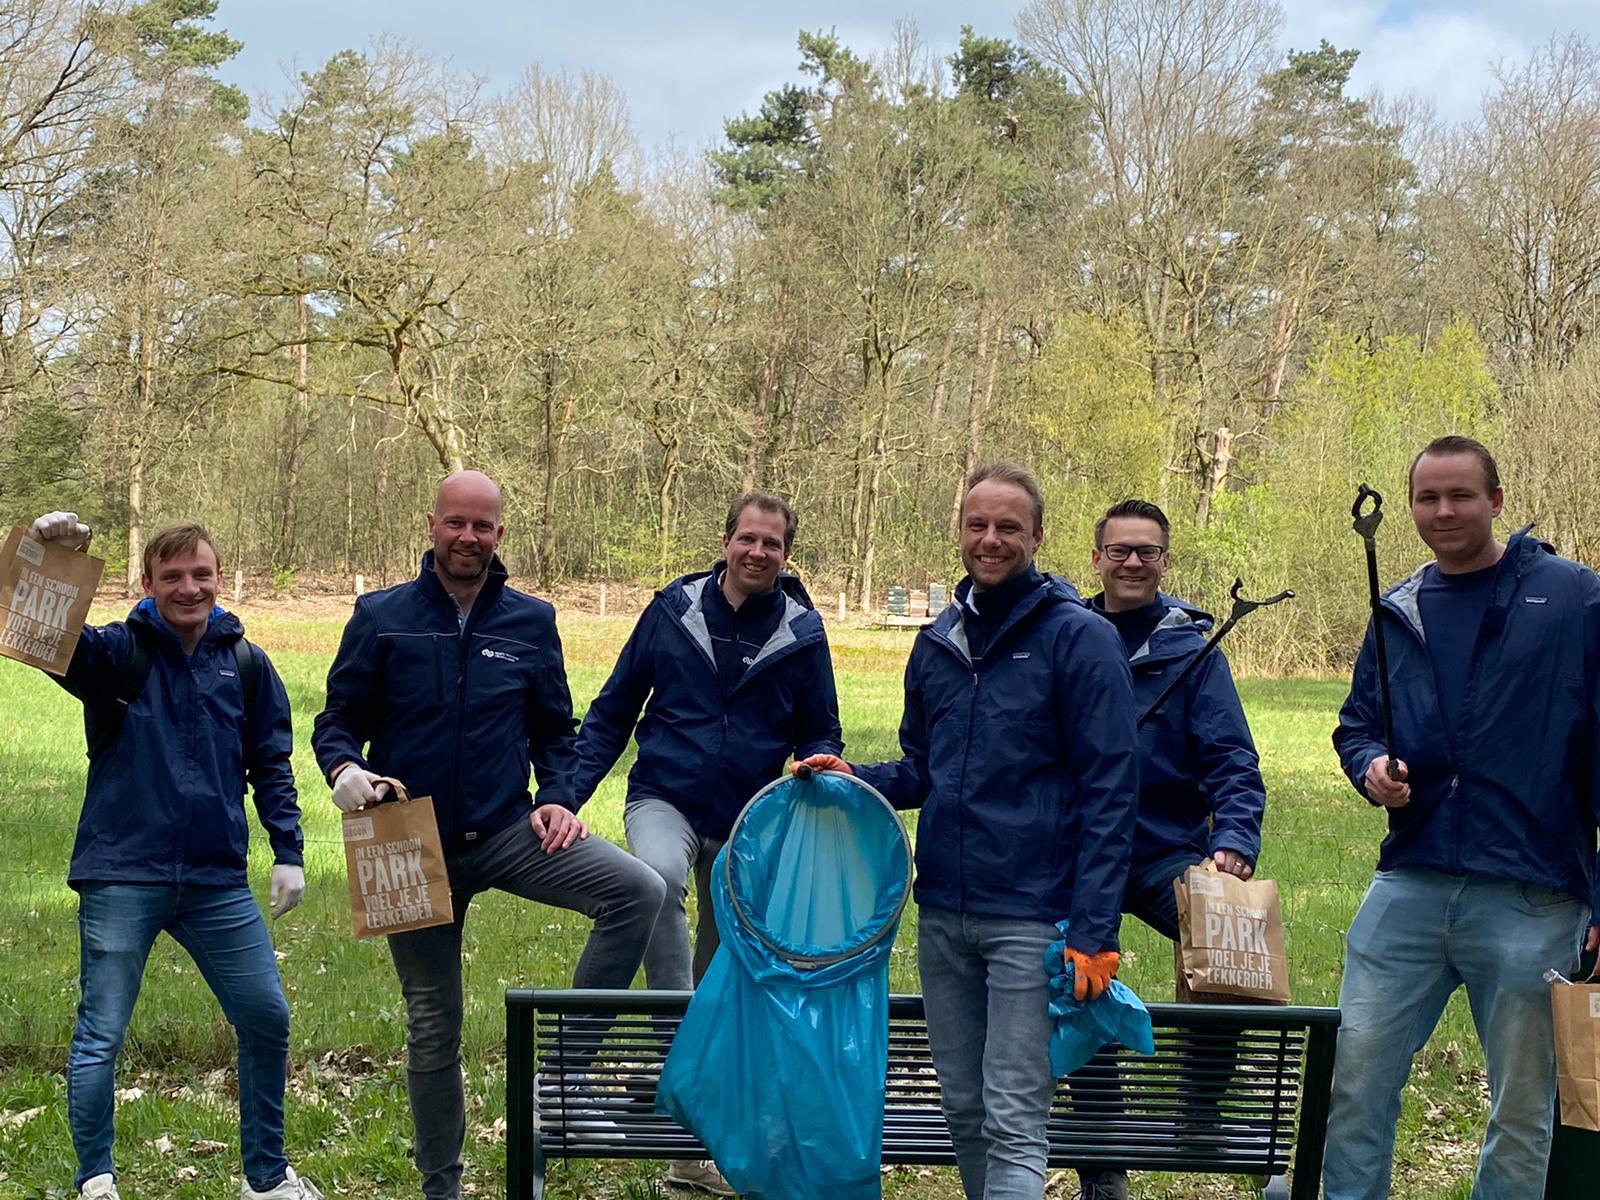 Convertus Employees cleaning up litter in their neighbourhoods